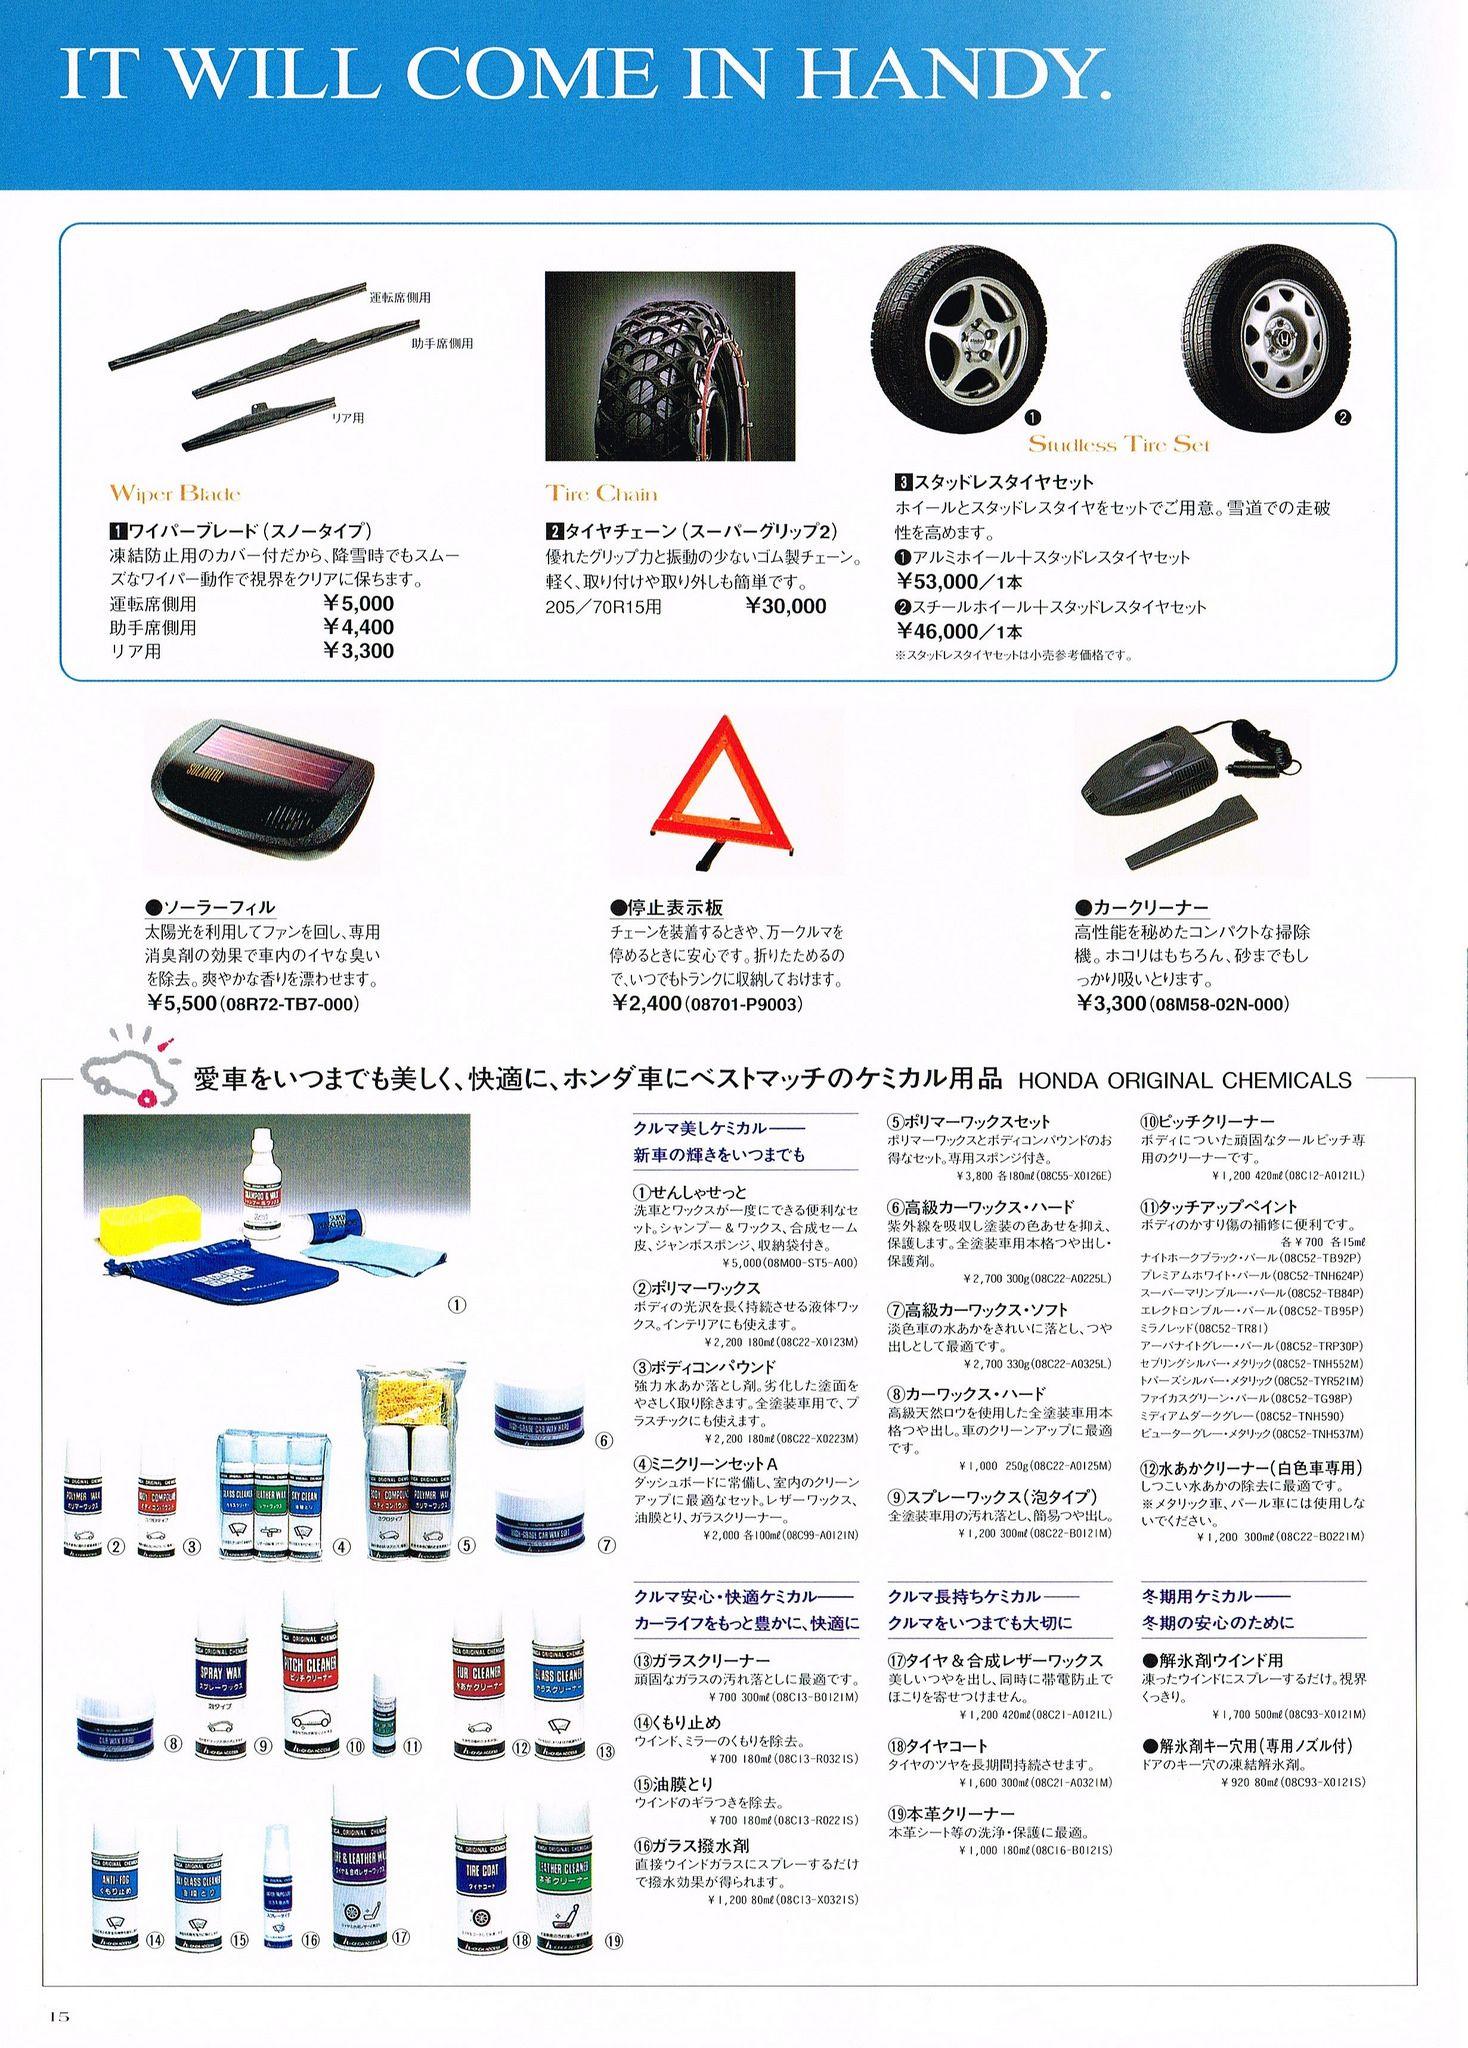 Honda Cr V Mk1 Japan Accessory Brochure 1999 Honda Cr V Honda Cr